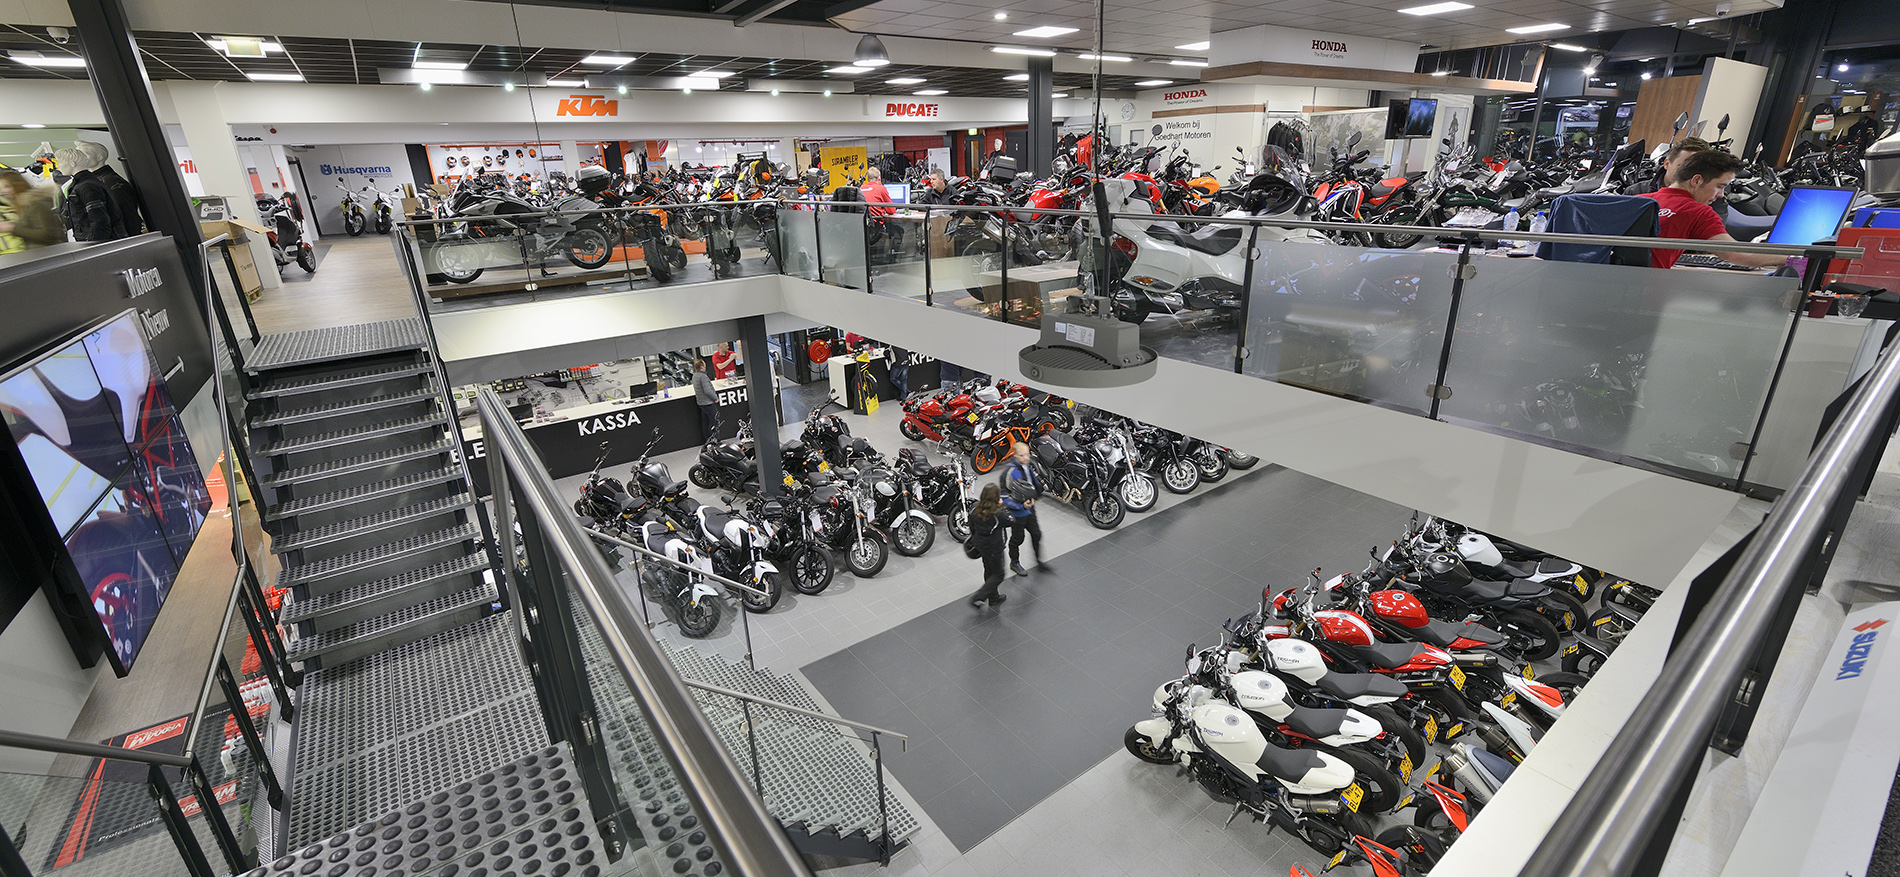 Goedhart Motoren Bodegraven Wsb Shopfitting Succesful Dutch Retail Design